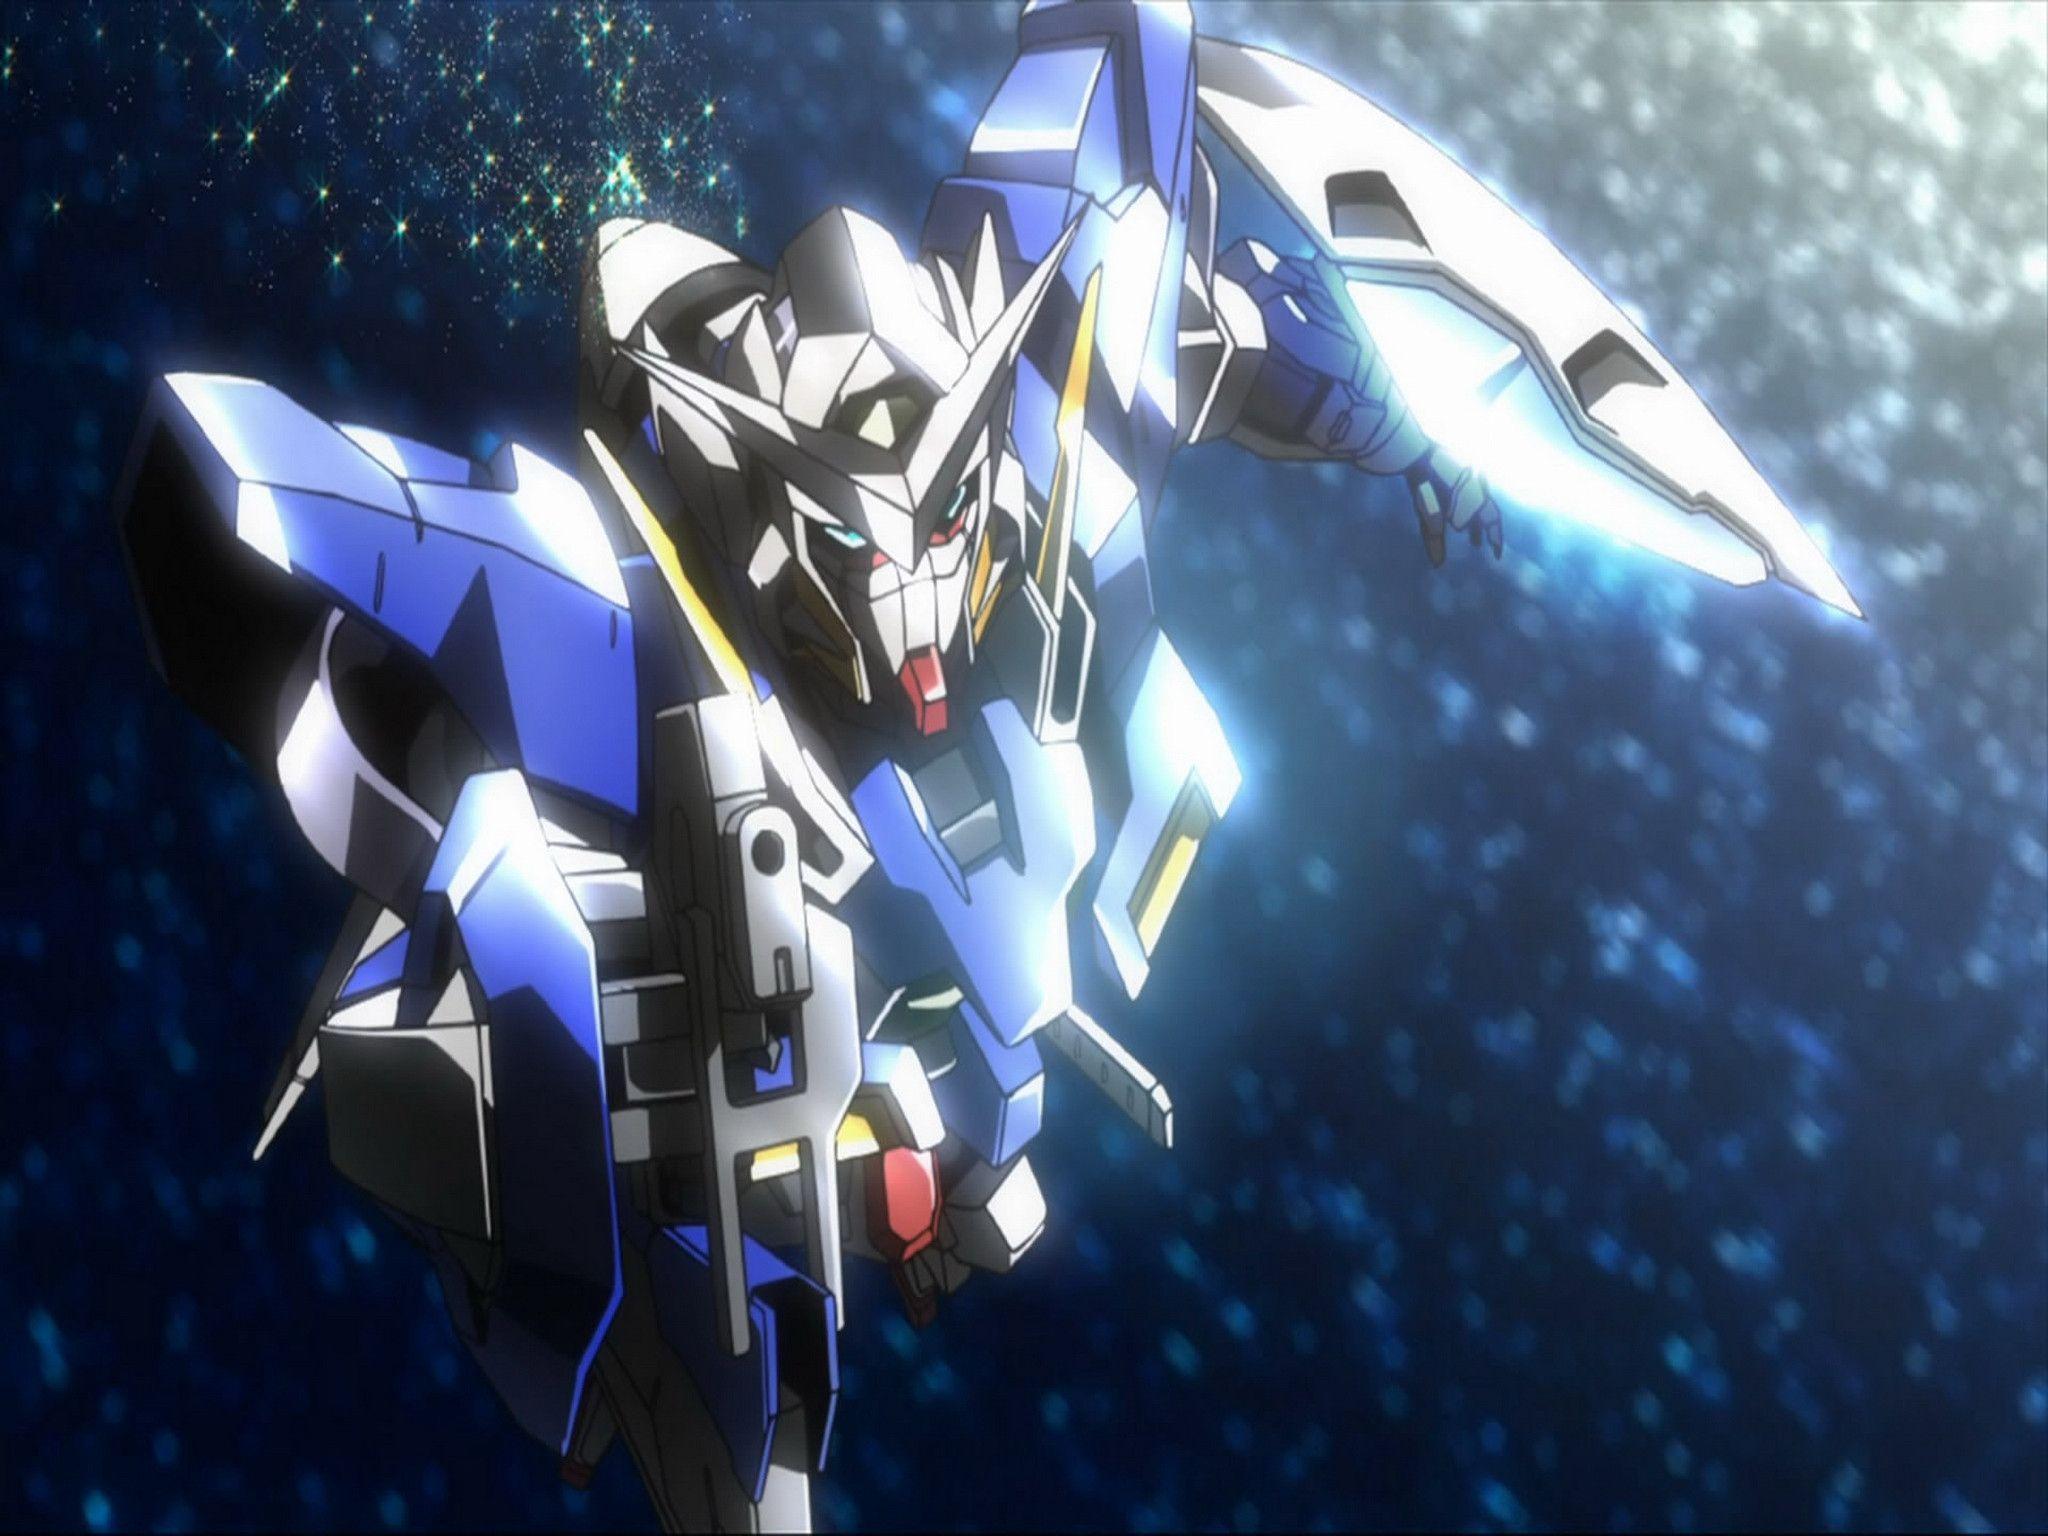 Gundam 00 Wallpapers HD - Wallpaper Cave